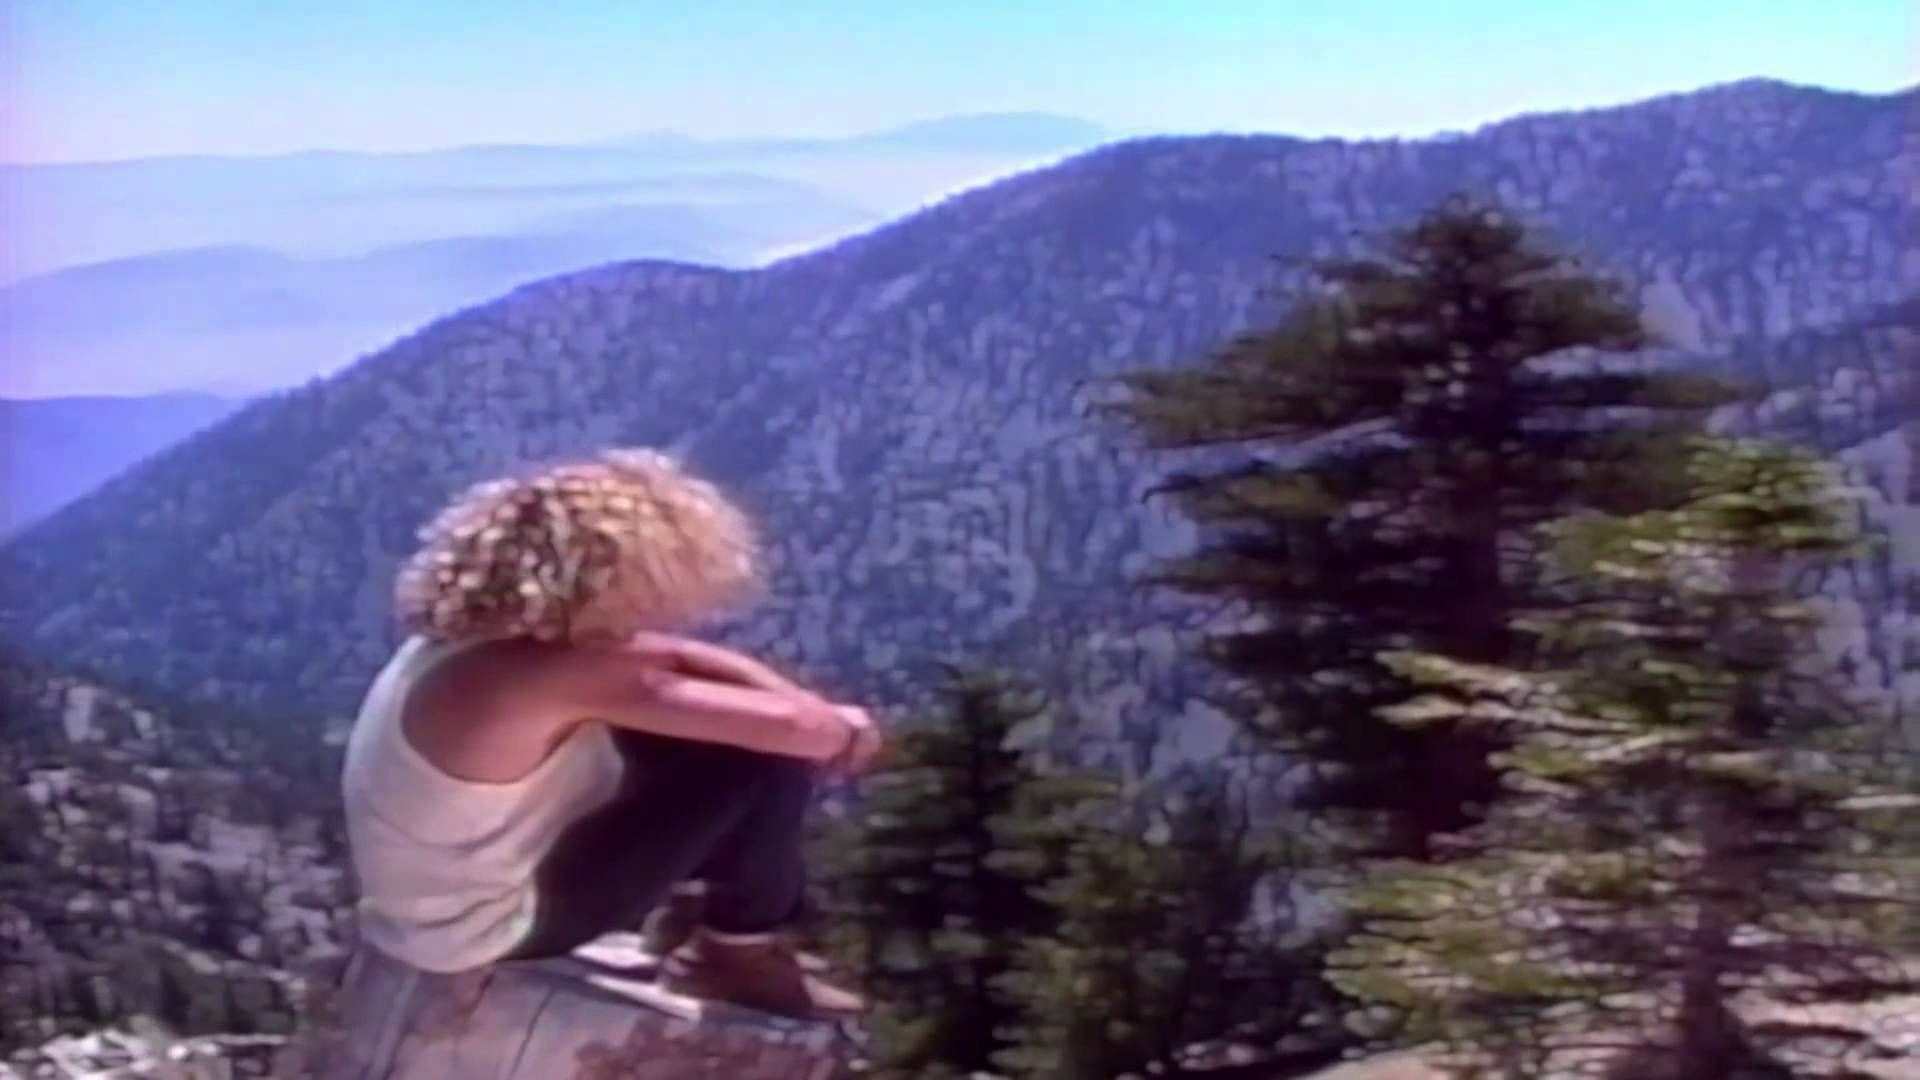 Van Halen Jamie S Cryin Official Music Video With Images Van Halen Van Halen Videos Youtube Videos Music